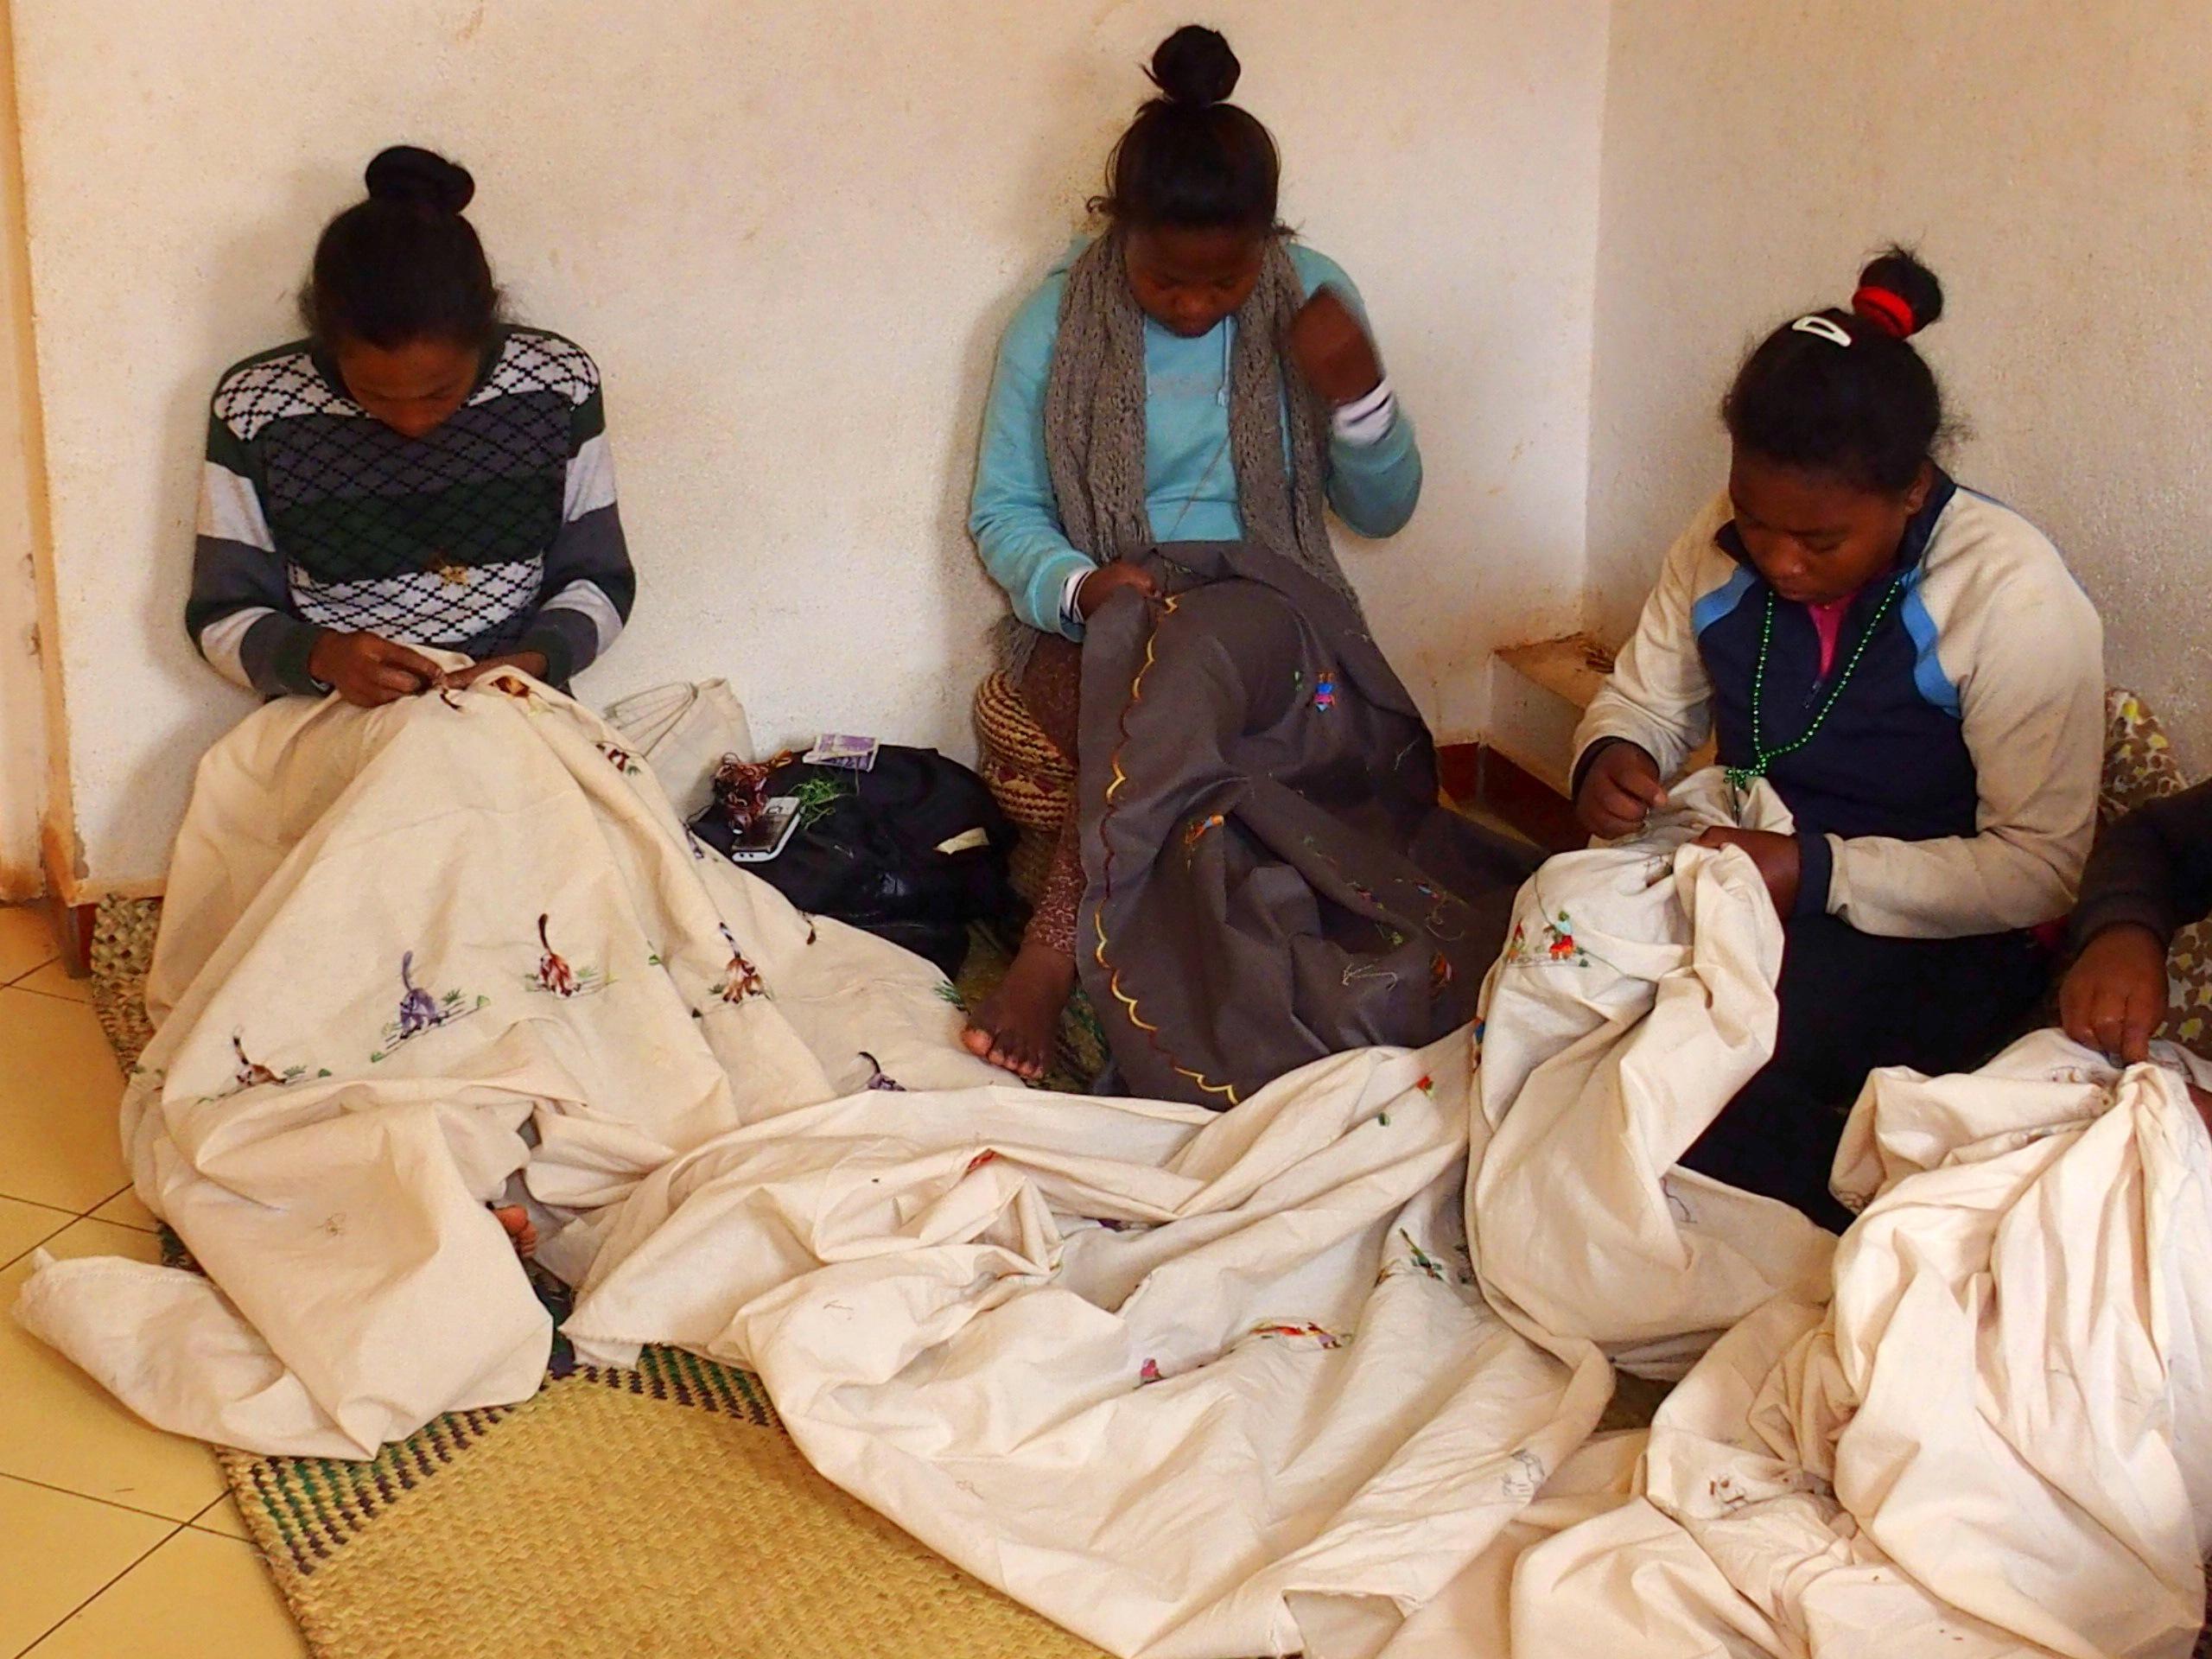 Brodeuses artisanat malgache